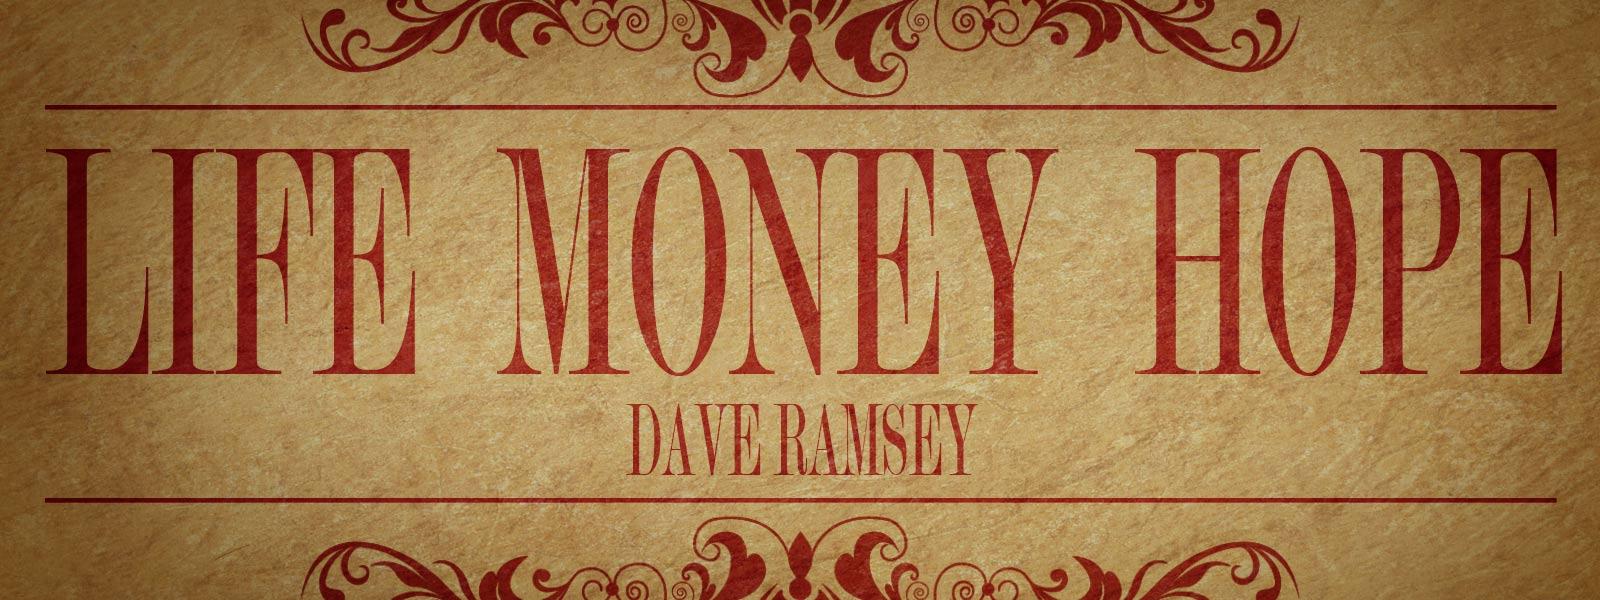 Life, Money & Hope